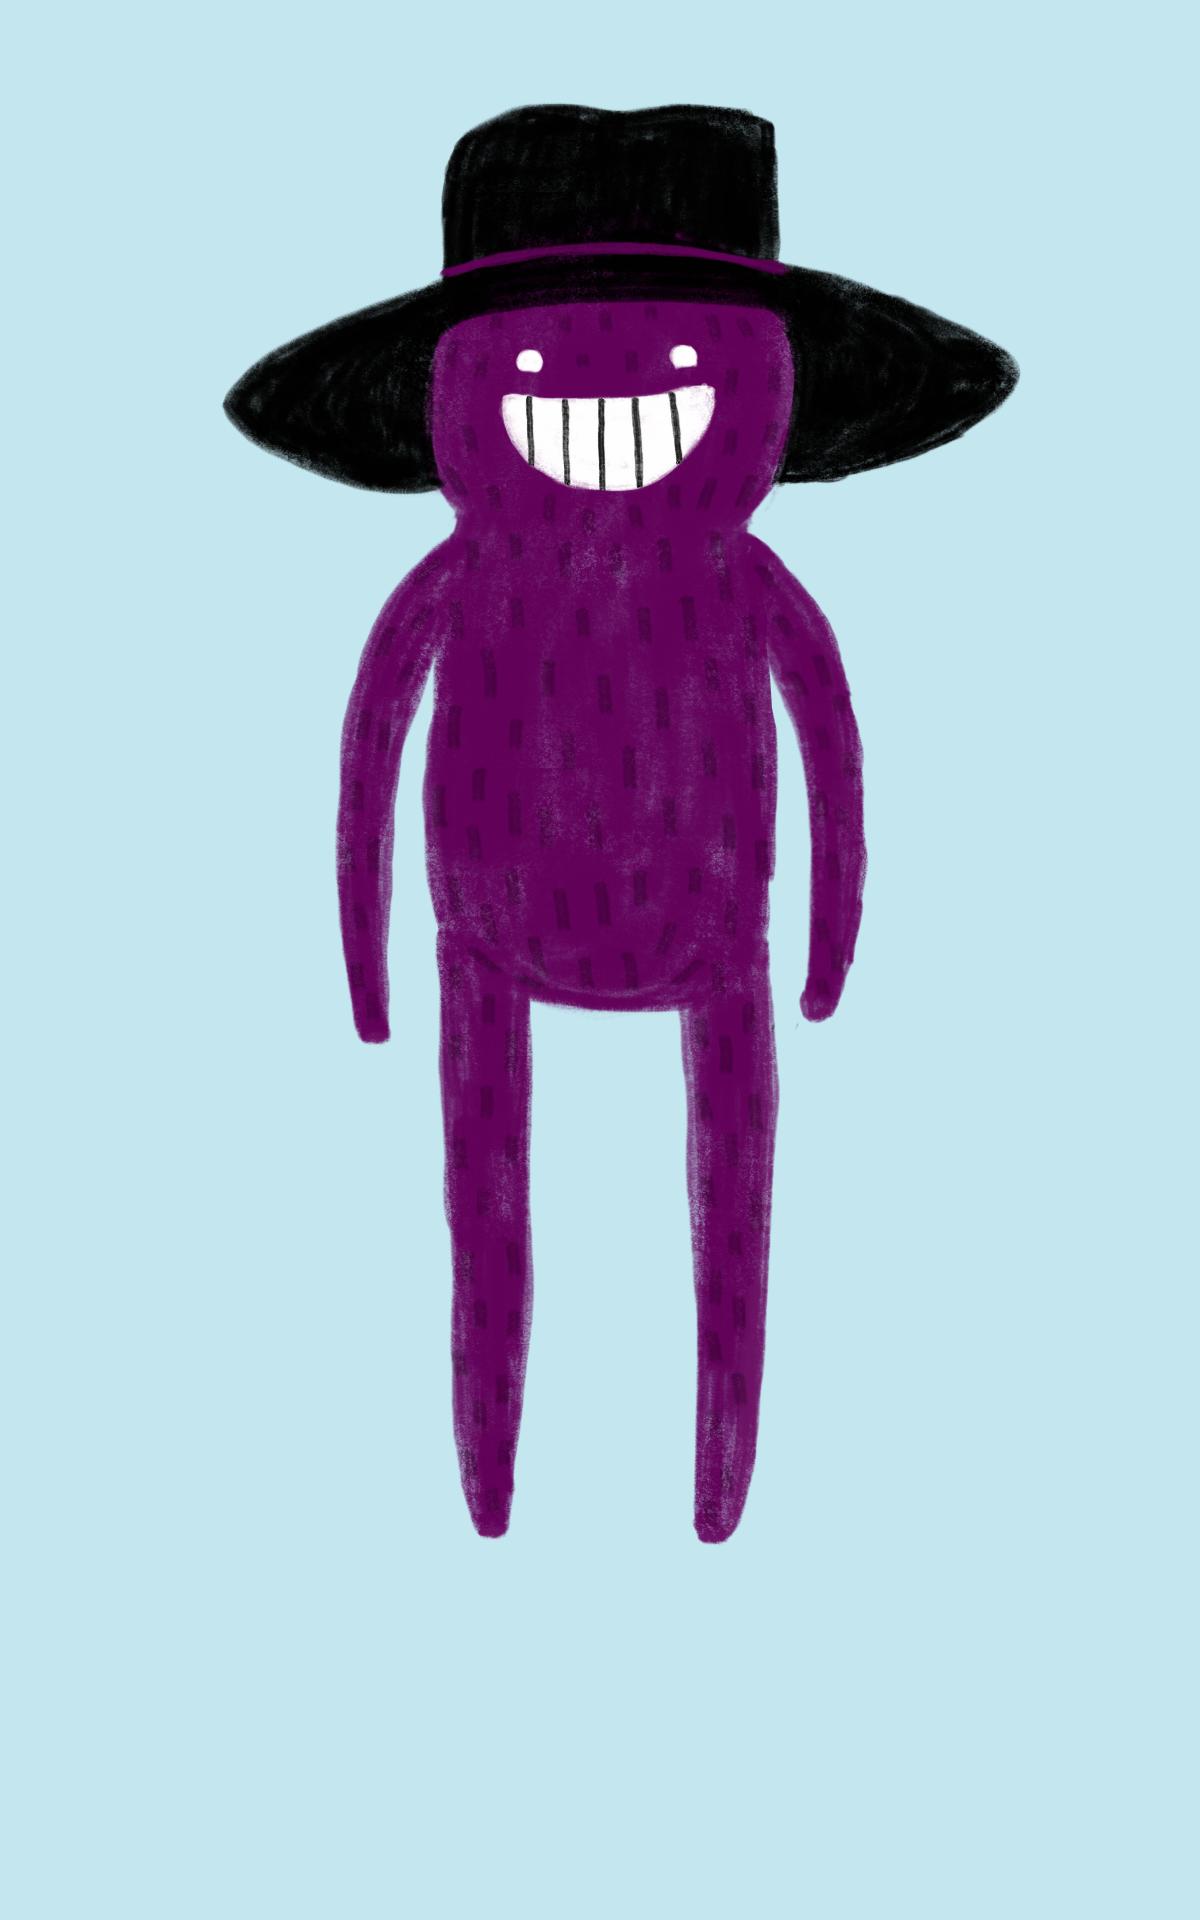 A friendly Hat Man.